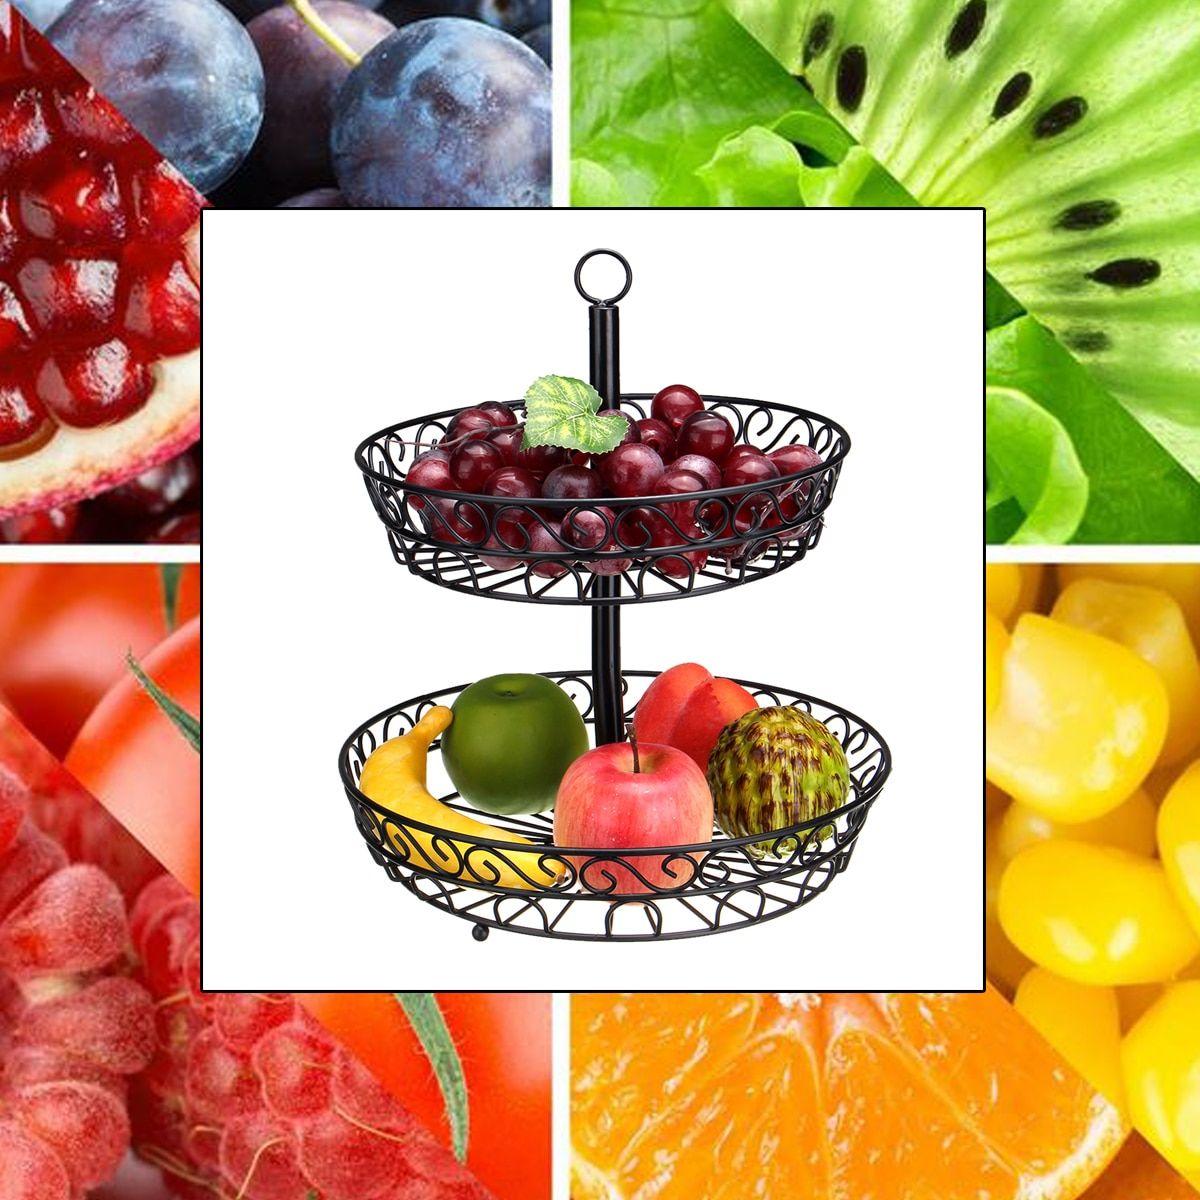 Details about Fruit Basket Bowl Stand Holder Kitchen Storage Rack Double  Layer Tier Organizer